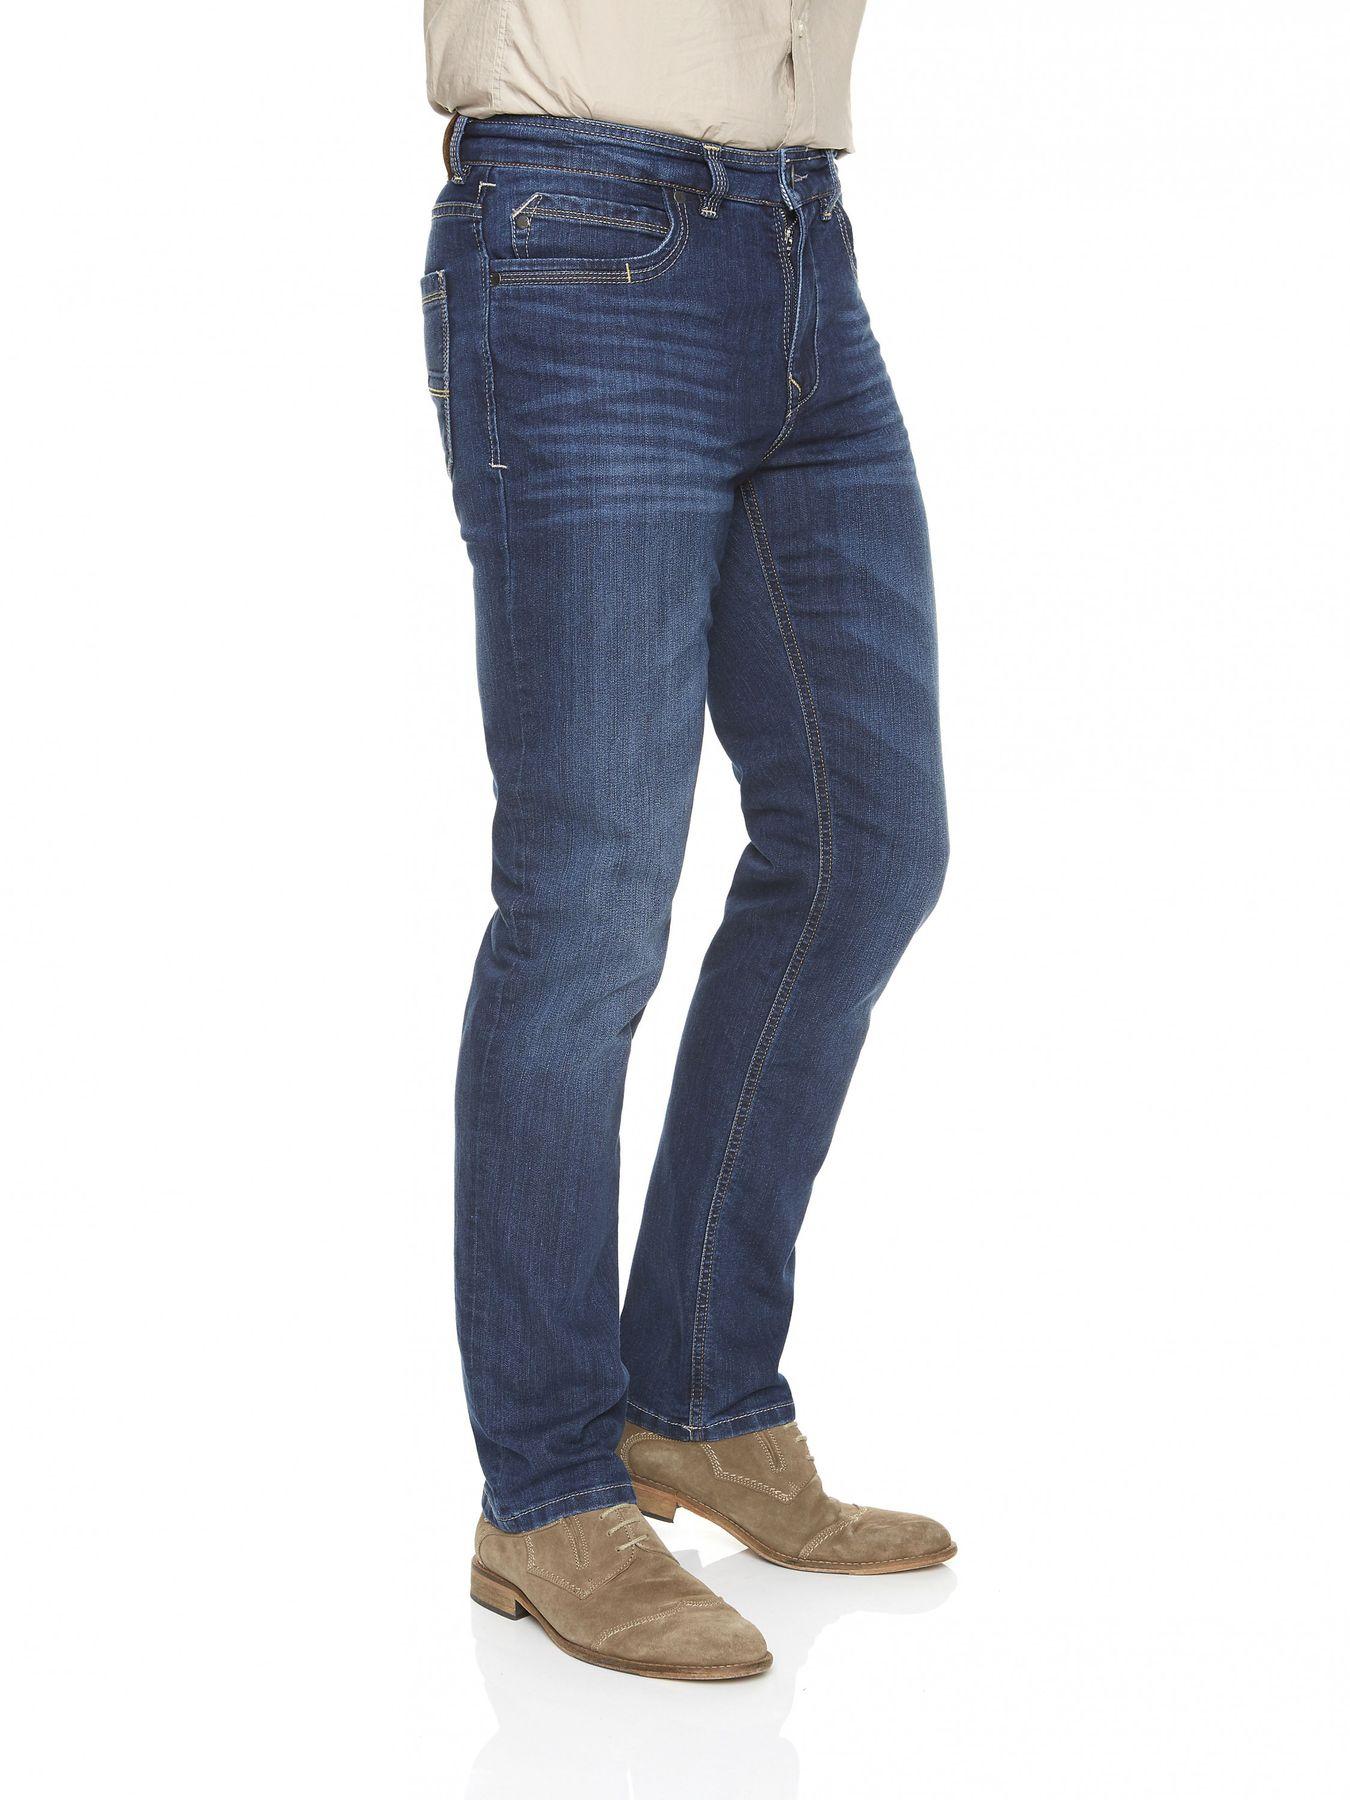 Atelier Gardeur - Herren 5-Pocket Jeans Superflex, Farben black(99), dark stone(68), stone blue(67), anthrazit(198) BATU (71001) – Bild 2